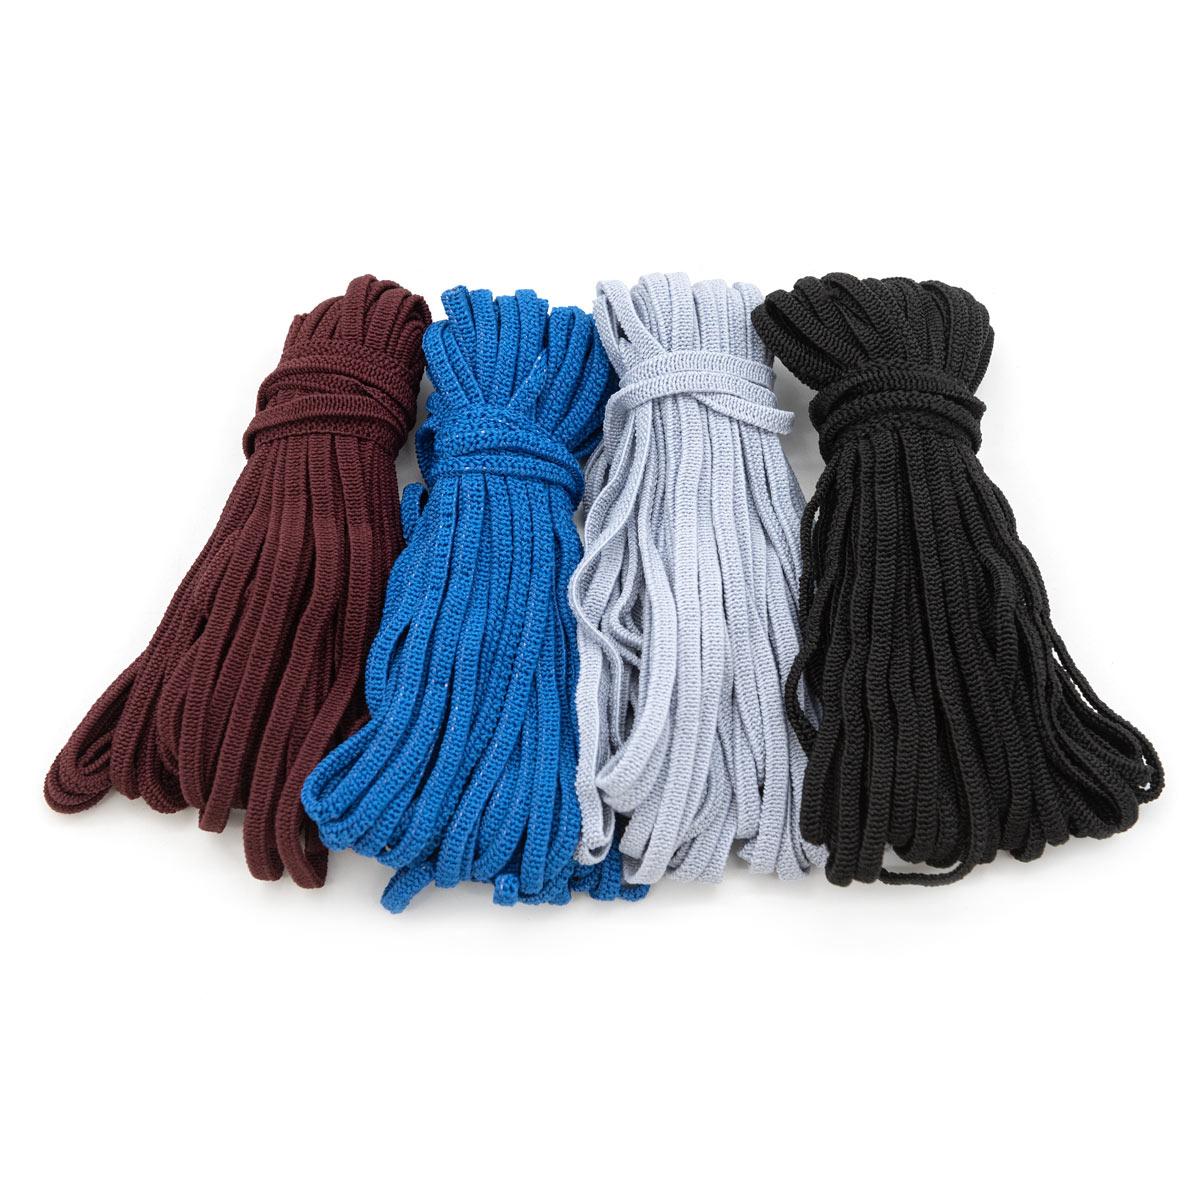 Резинка мягкая масочная 4мм (4*10м), чер., сер., т.бордо, синий